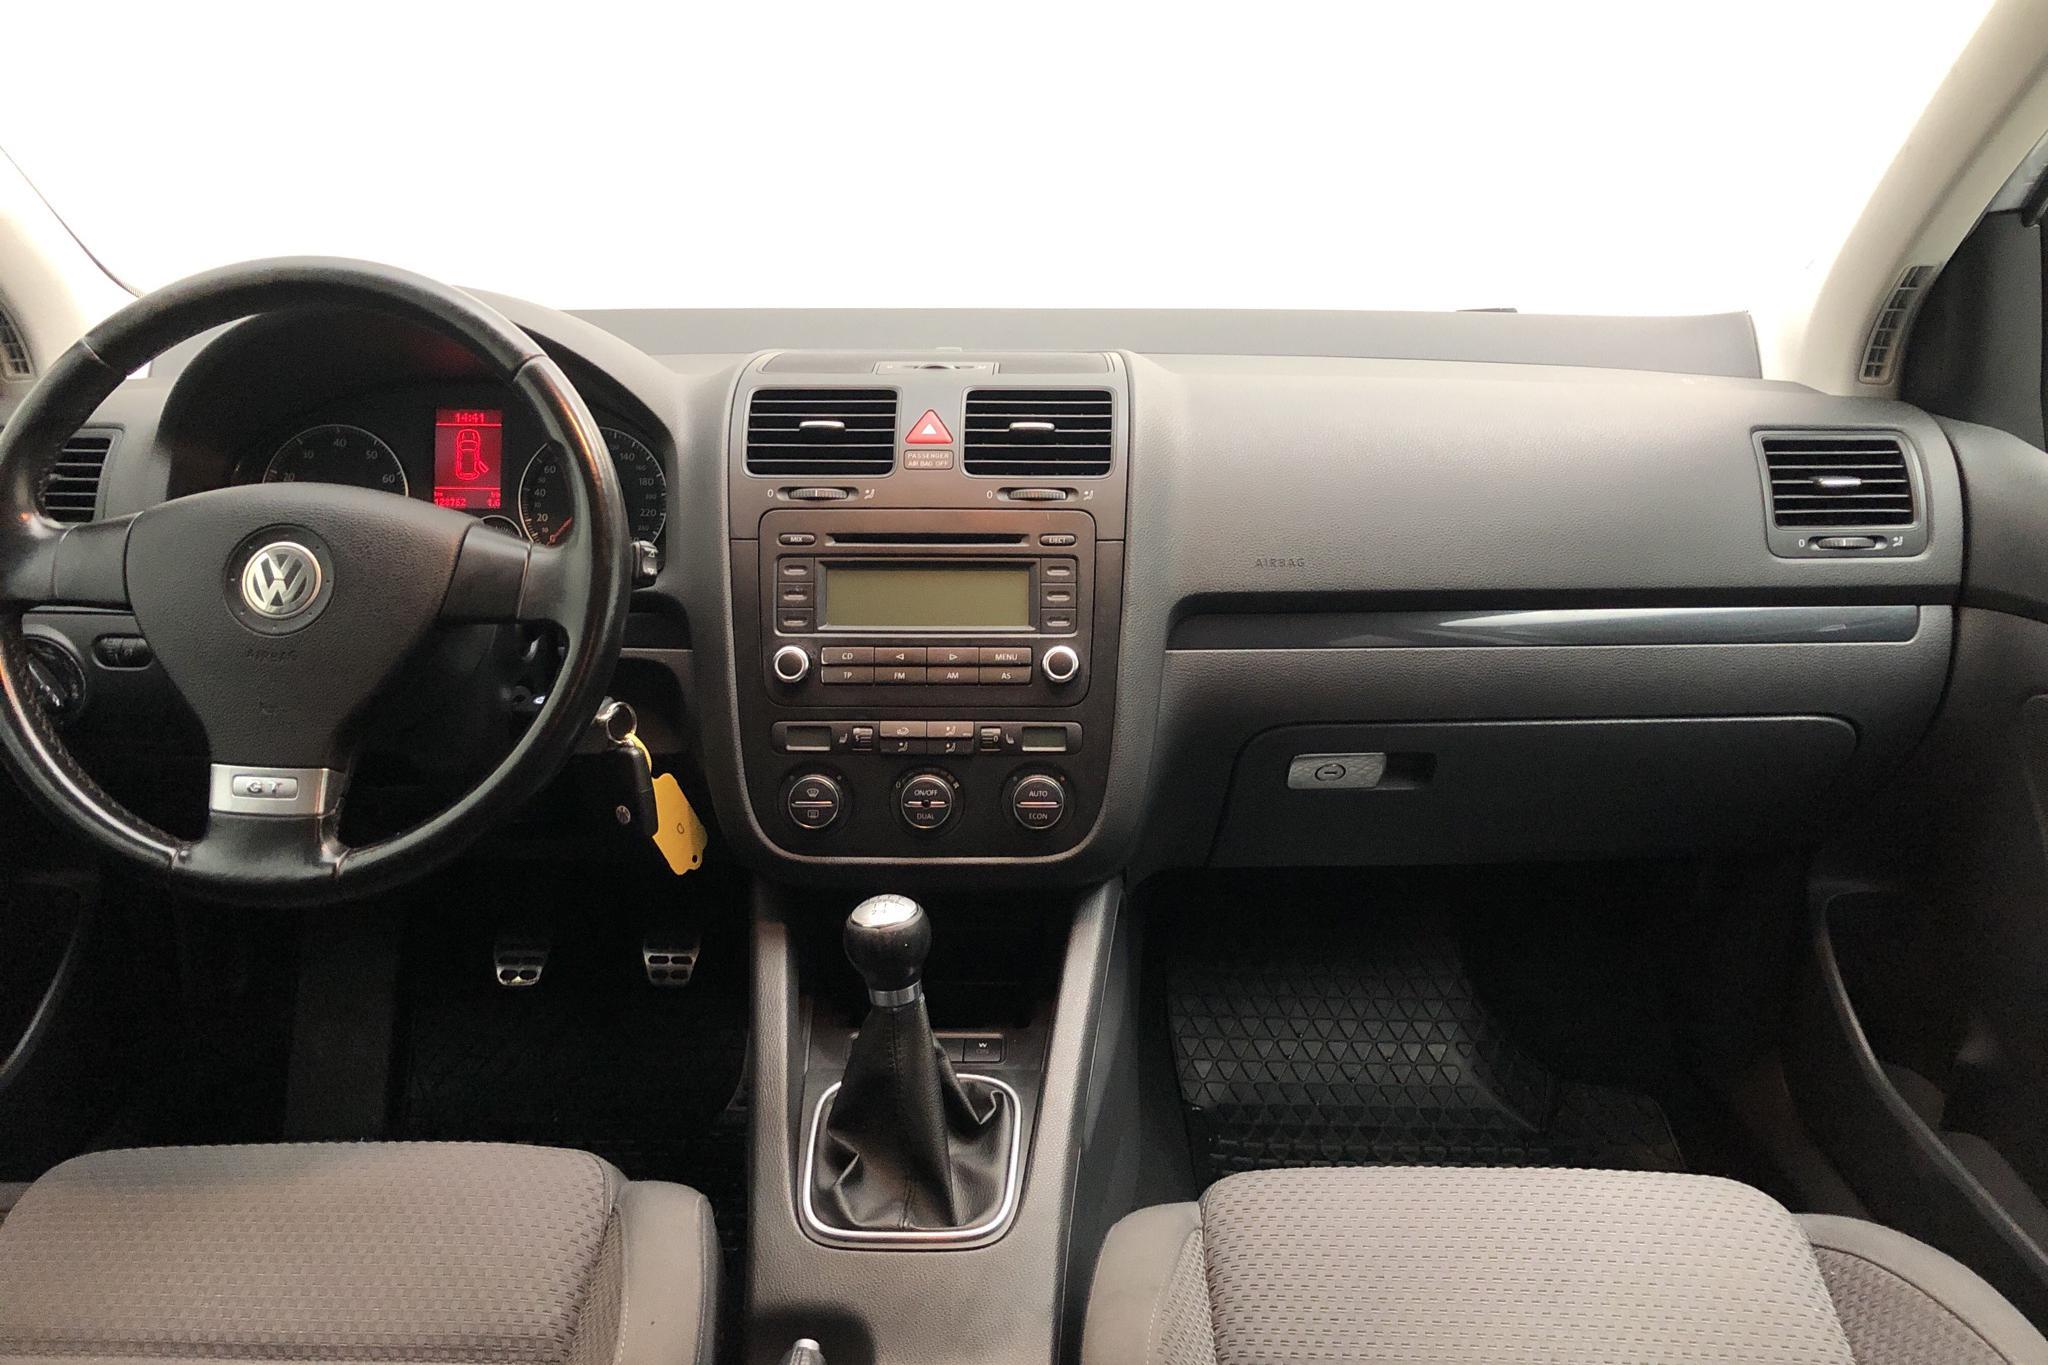 VW Golf A5 1.4 TSI GT Sport 5dr (170hk) - 12 876 mil - Manuell - silver - 2006